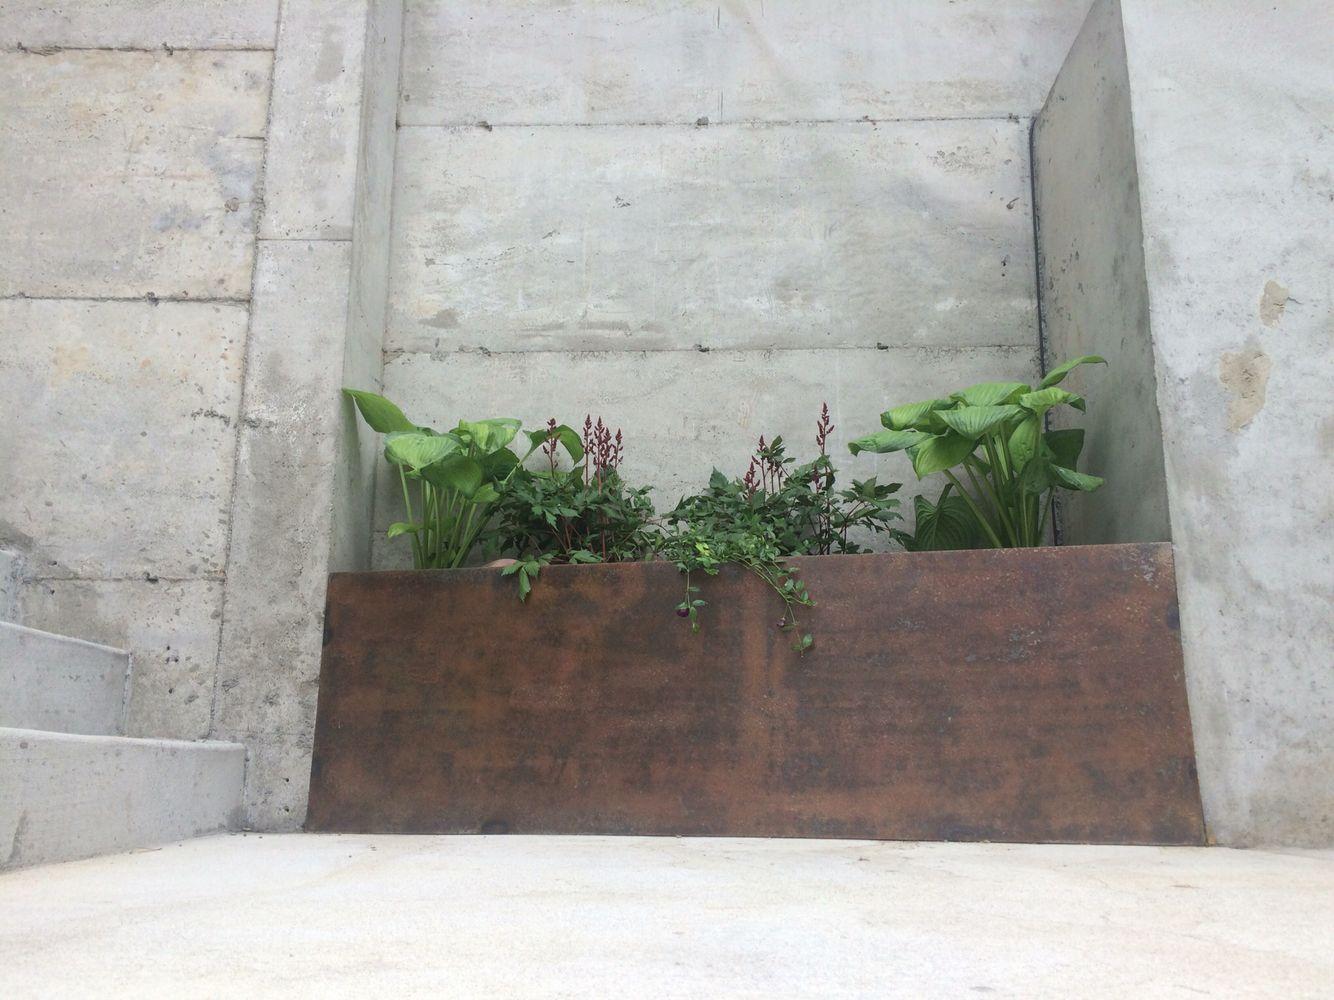 Patina Planter Box Concrete Wall Planter Boxes Concrete Wall Planters